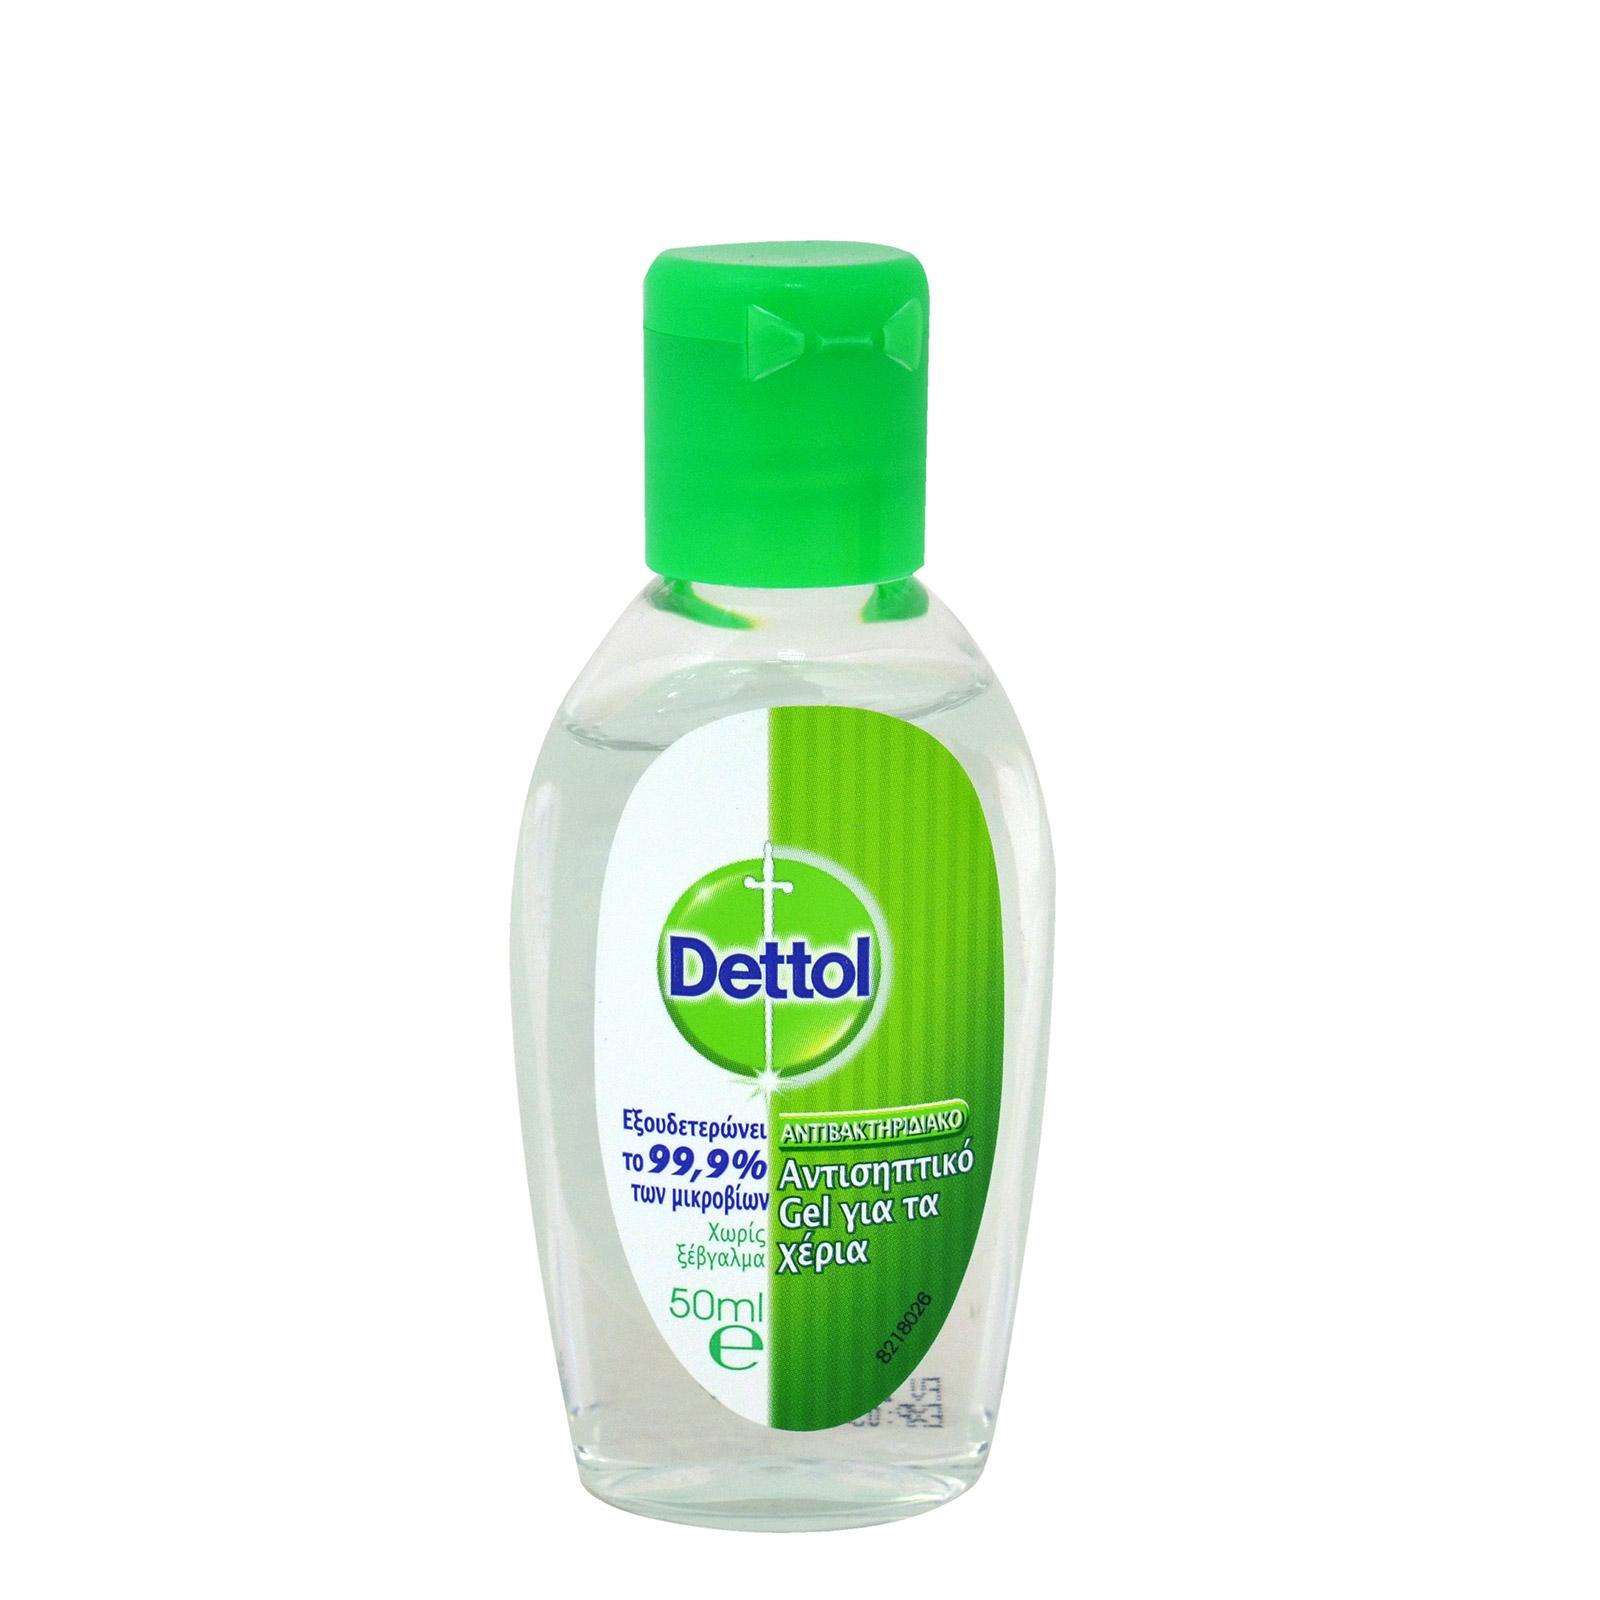 Dettol Hand Sanitizer Gel 50ml